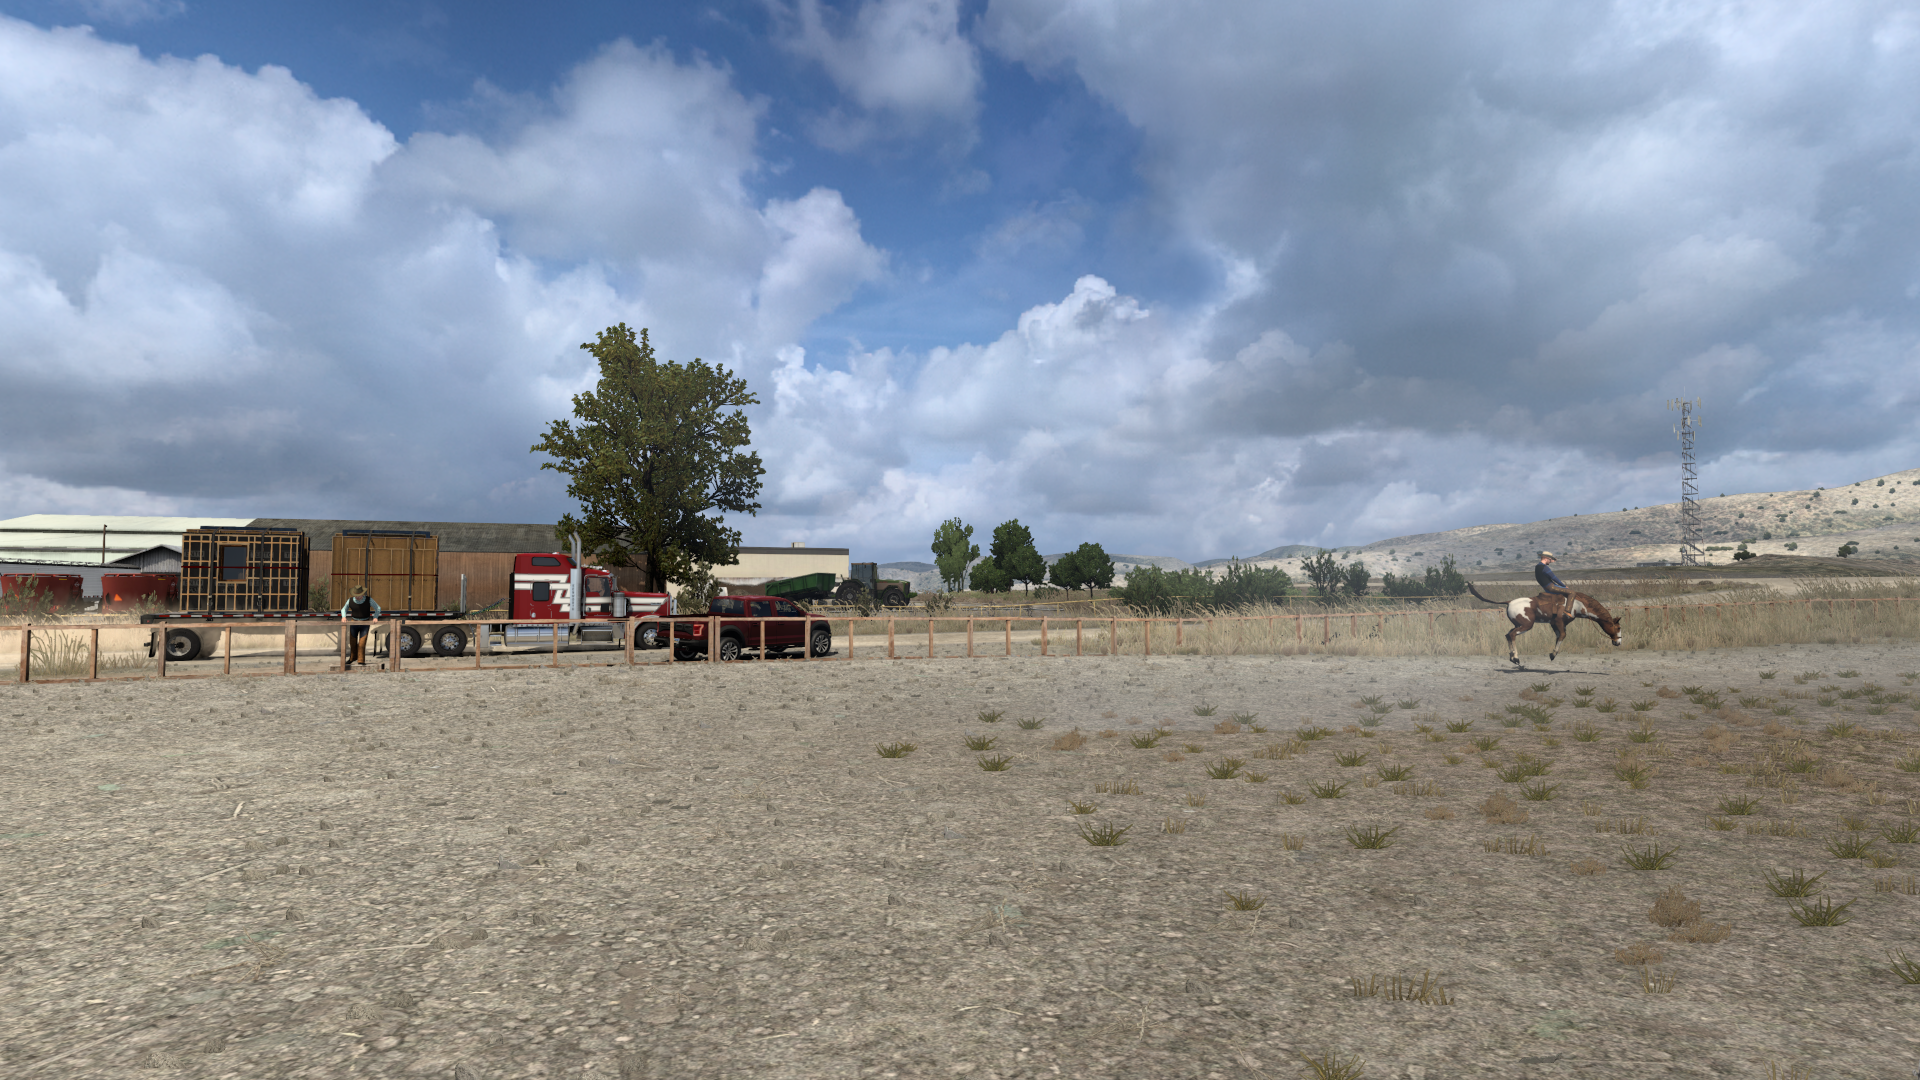 ats_20210911_173559_00.png - American Truck Simulator